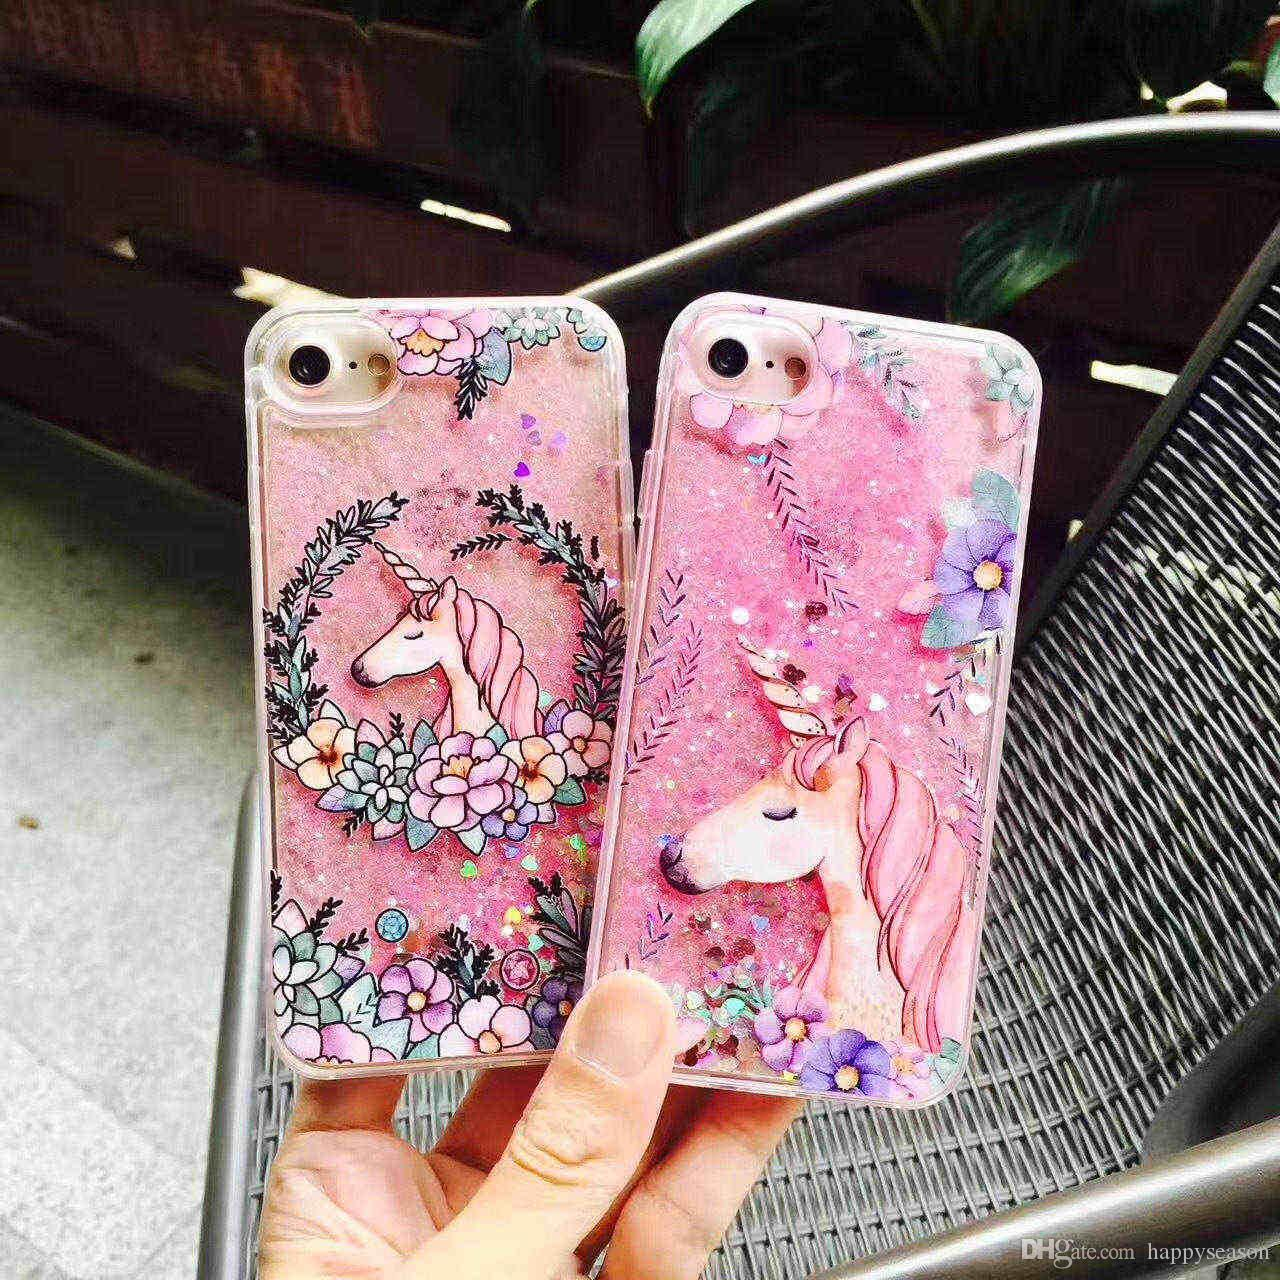 Unicorn Phone Case Iphone